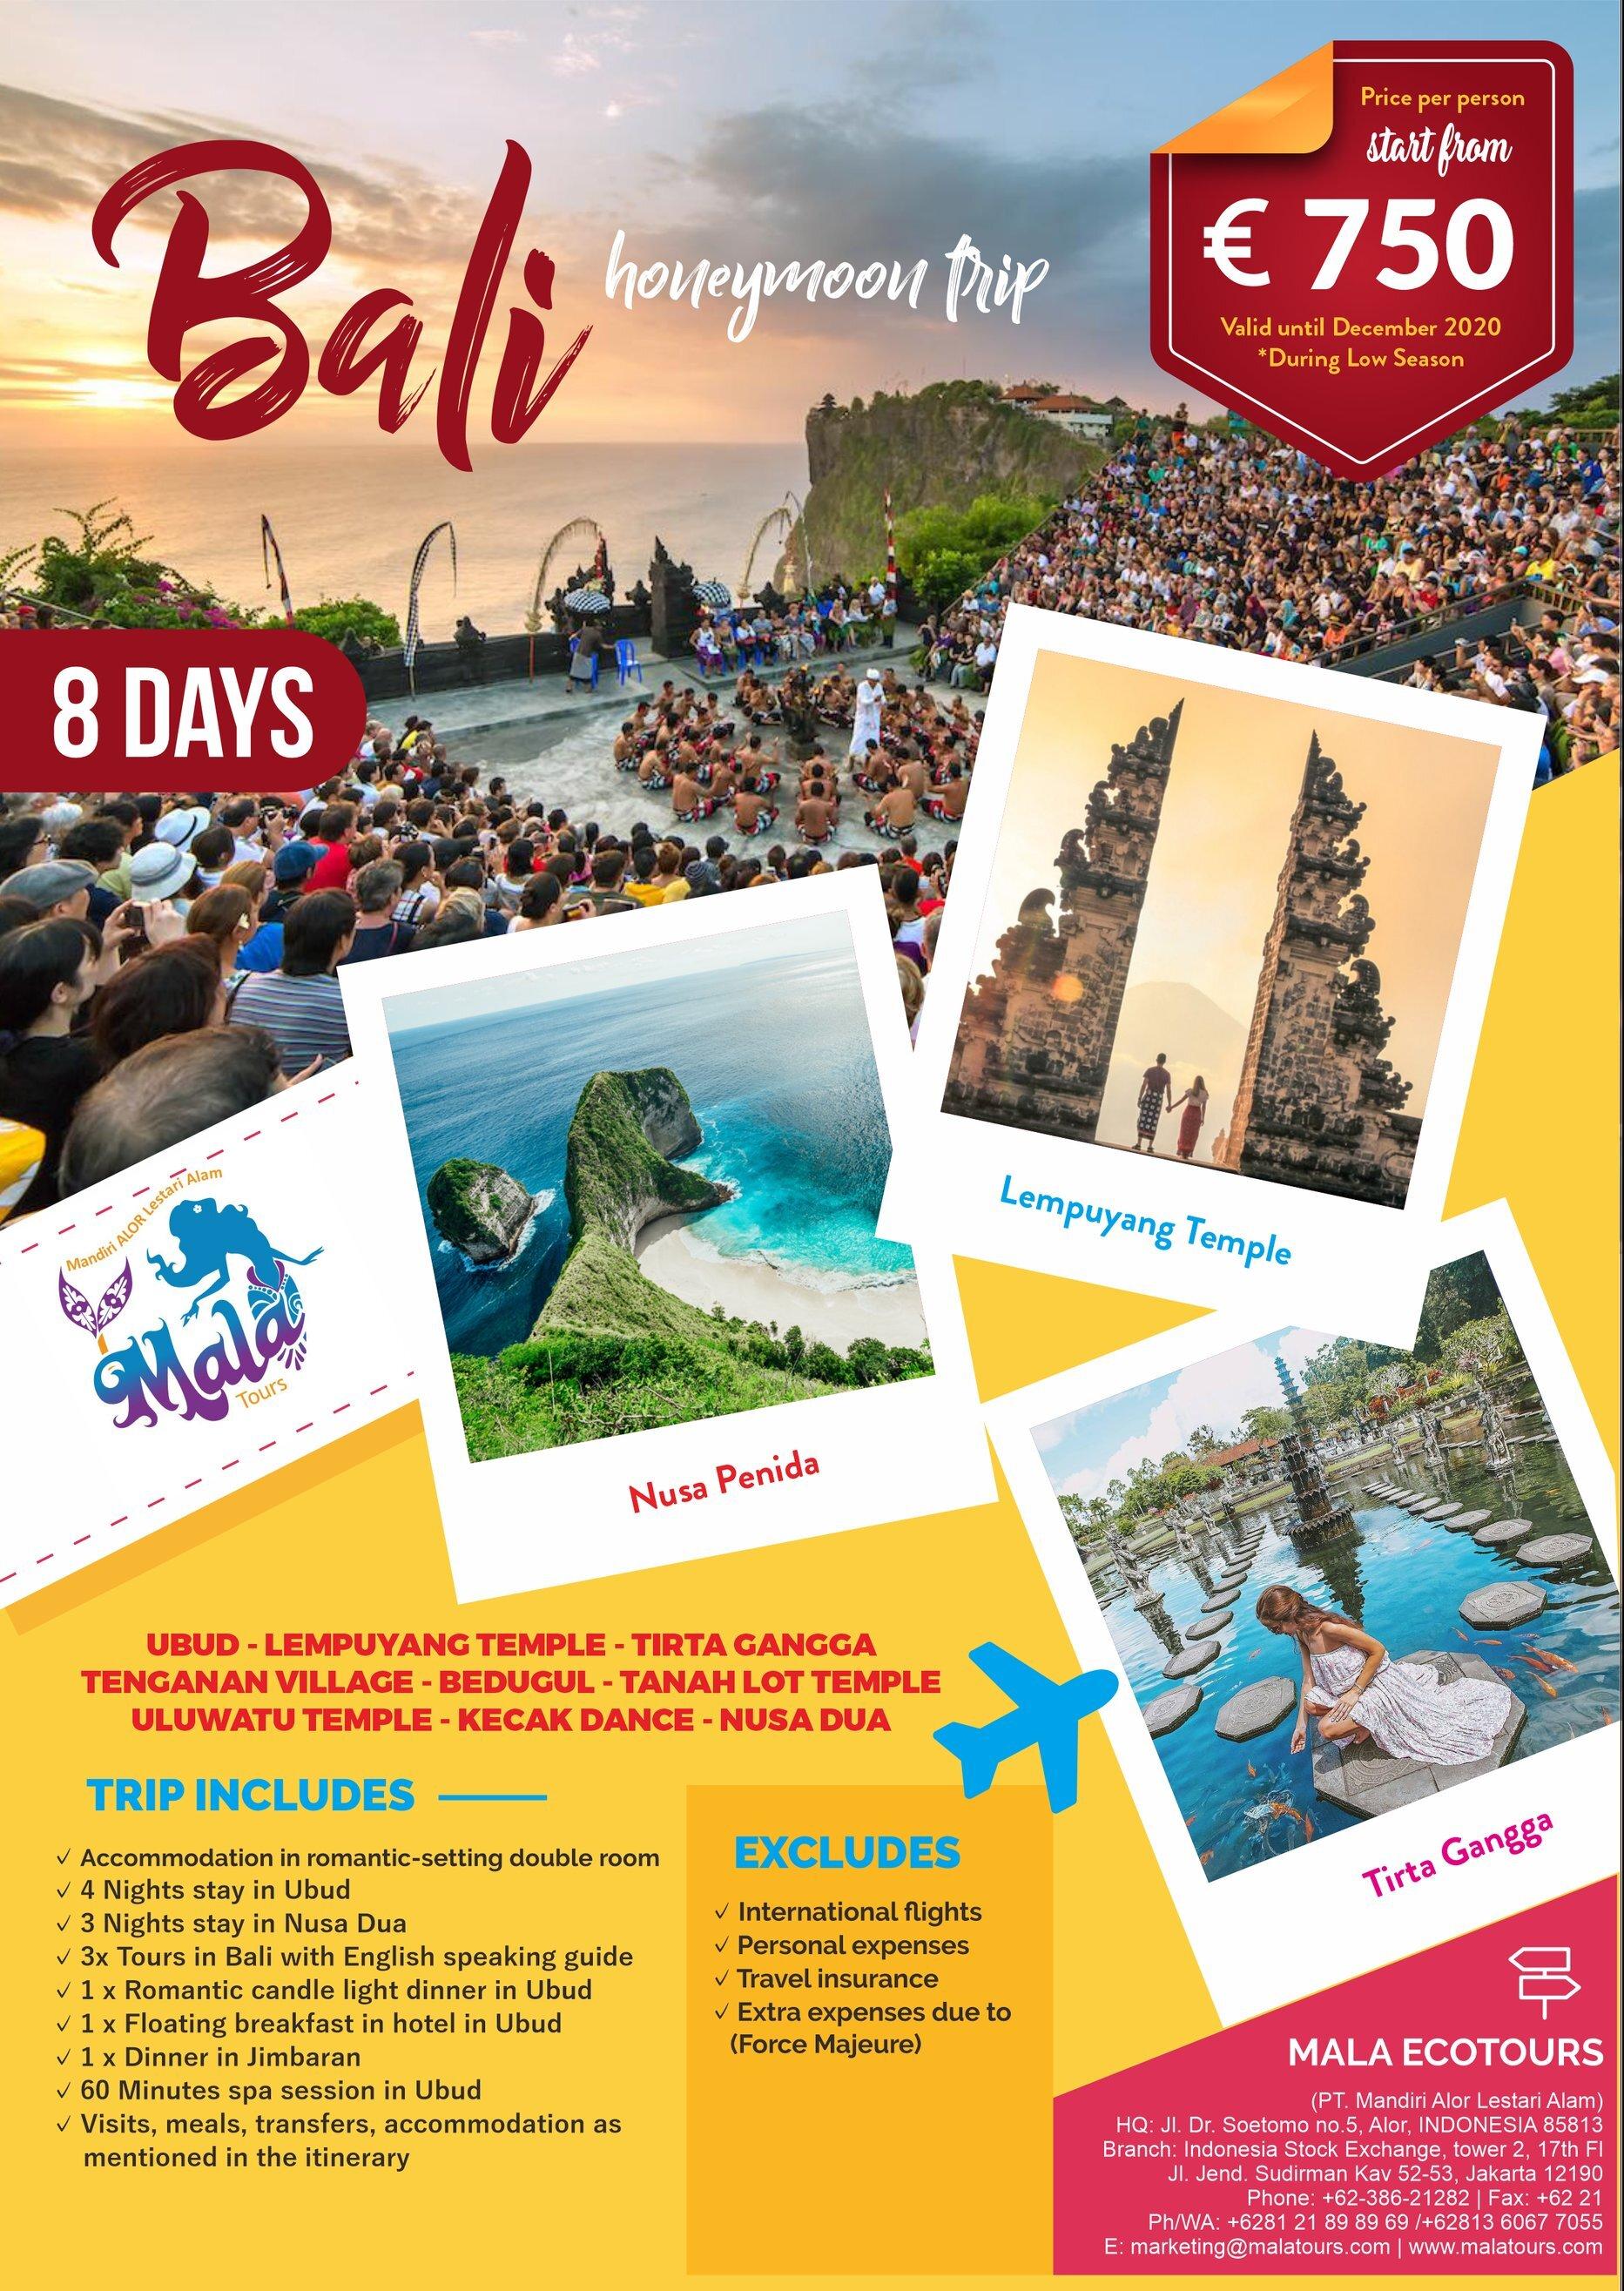 Promo Bali Honeymoon Tours Bali Wedding Anniversary Bali Flower Bath Bali Honeymoon Mala Tours